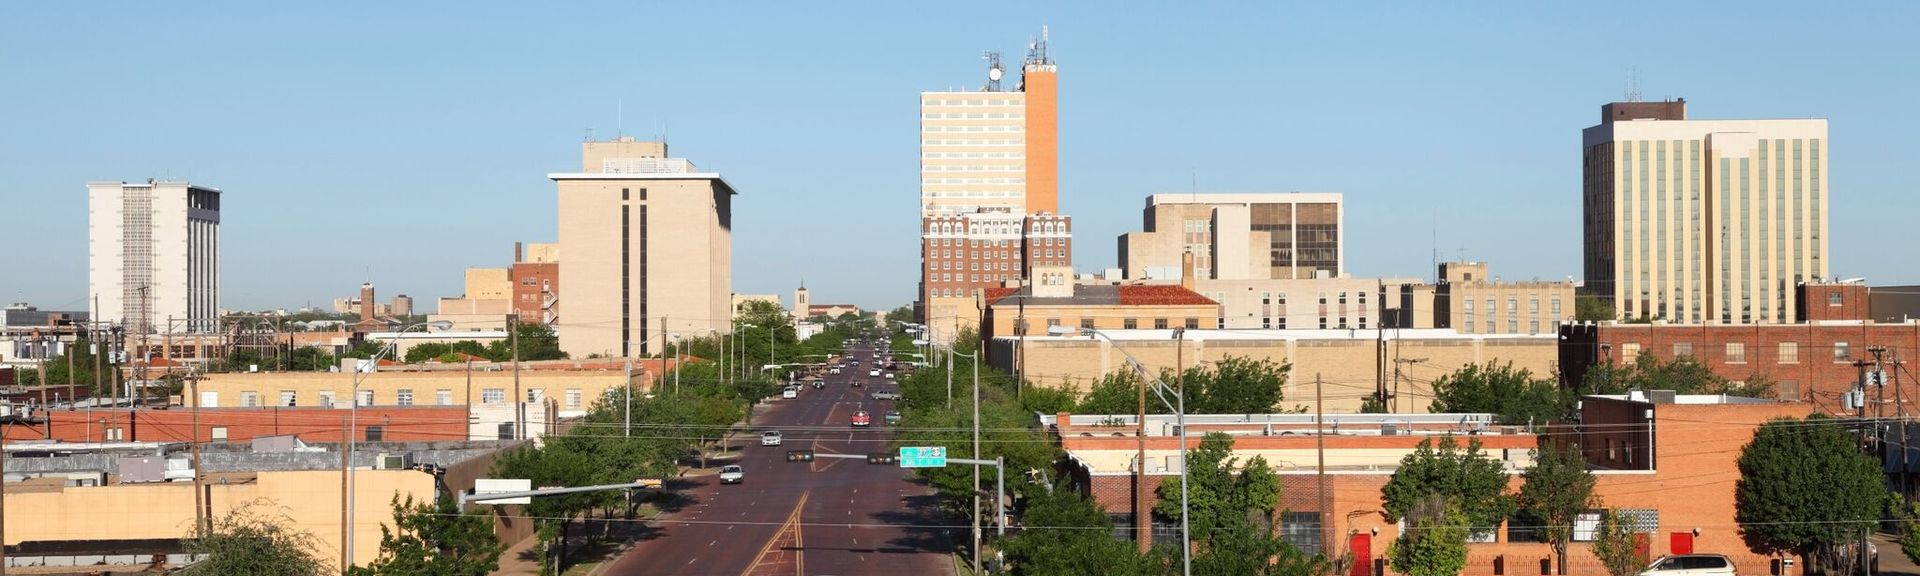 Lubbock, TX, USA